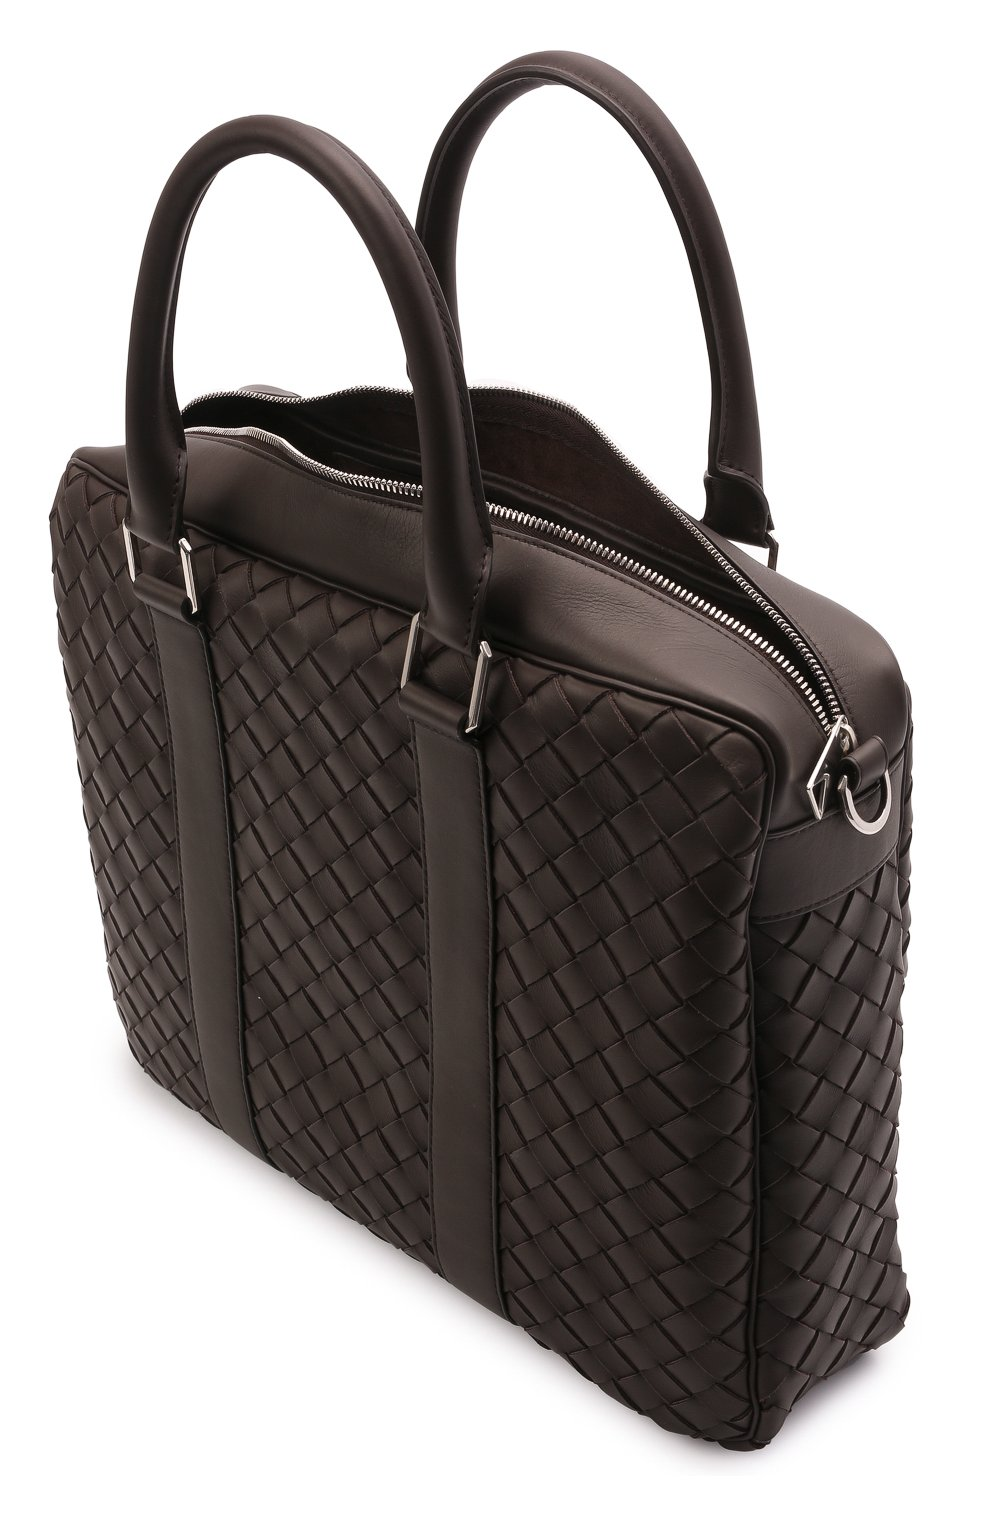 Мужская кожаная сумка для ноутбука BOTTEGA VENETA темно-коричневого цвета, арт. 650372/V0E51 | Фото 4